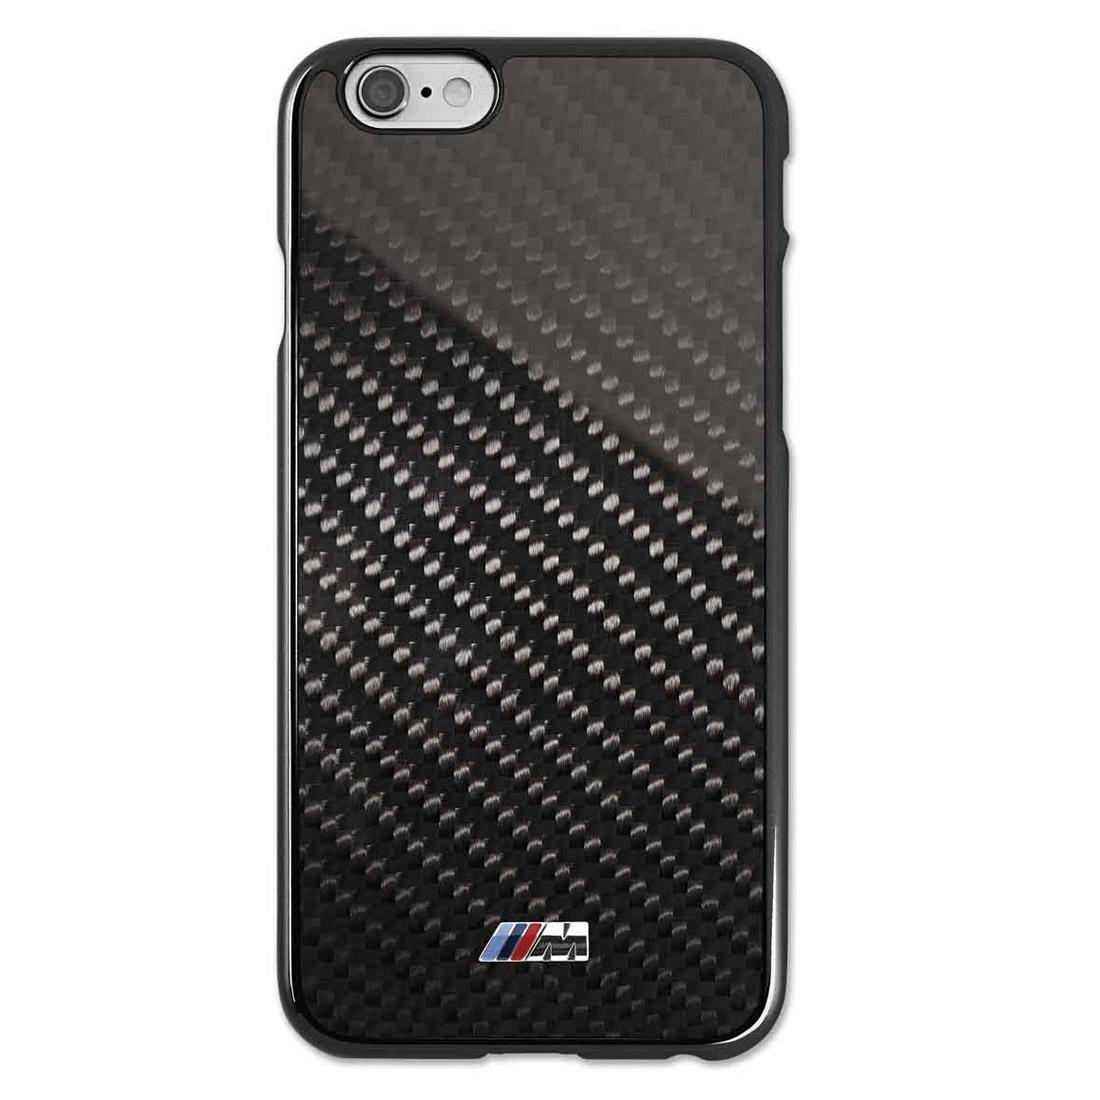 wholesale dealer bb195 f00b2 ShopBMWUSA.com: BMW M MOBILE CARBON FIBER PHONE CASE